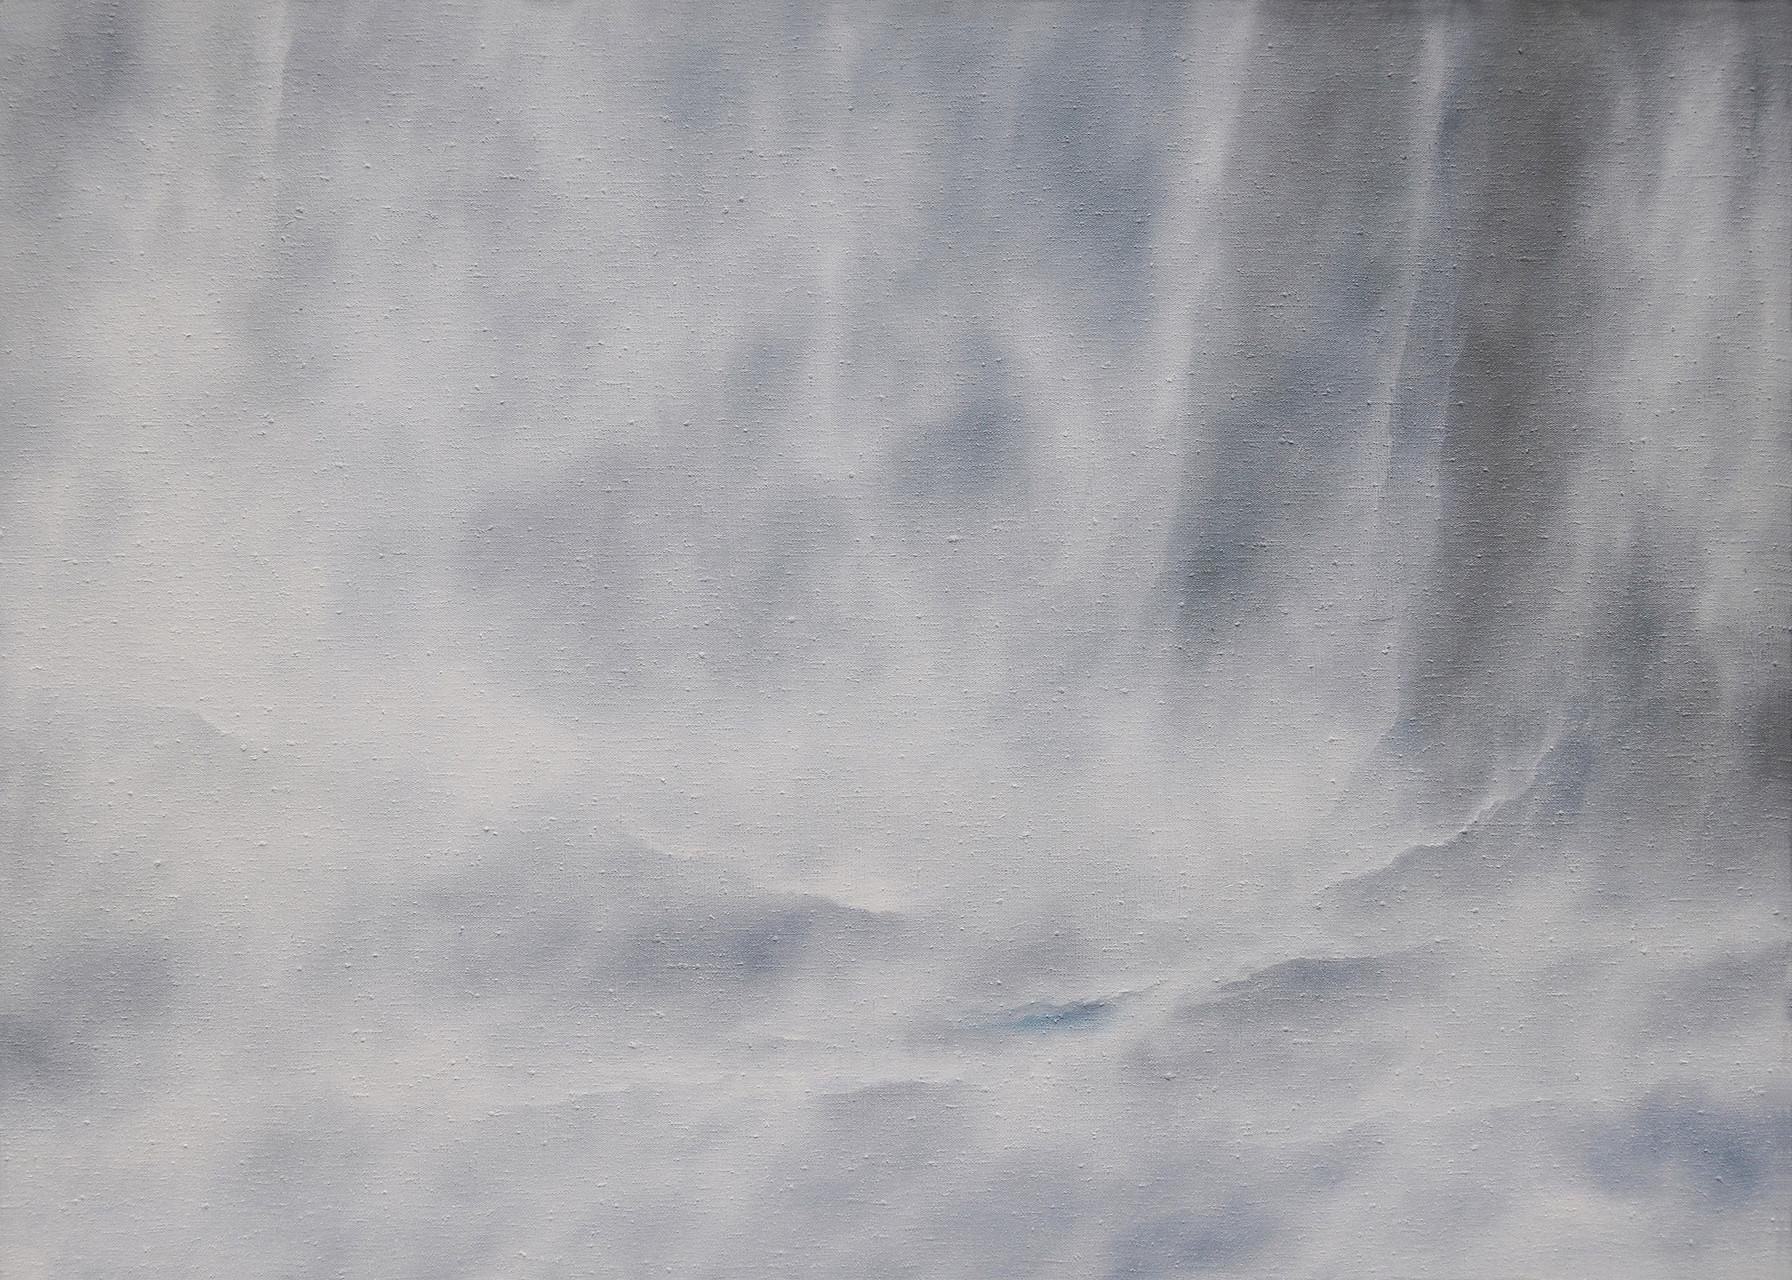 NORWEGEN, 2015, Öl/Lwd. (grob strukturiert), 100 x 140cm